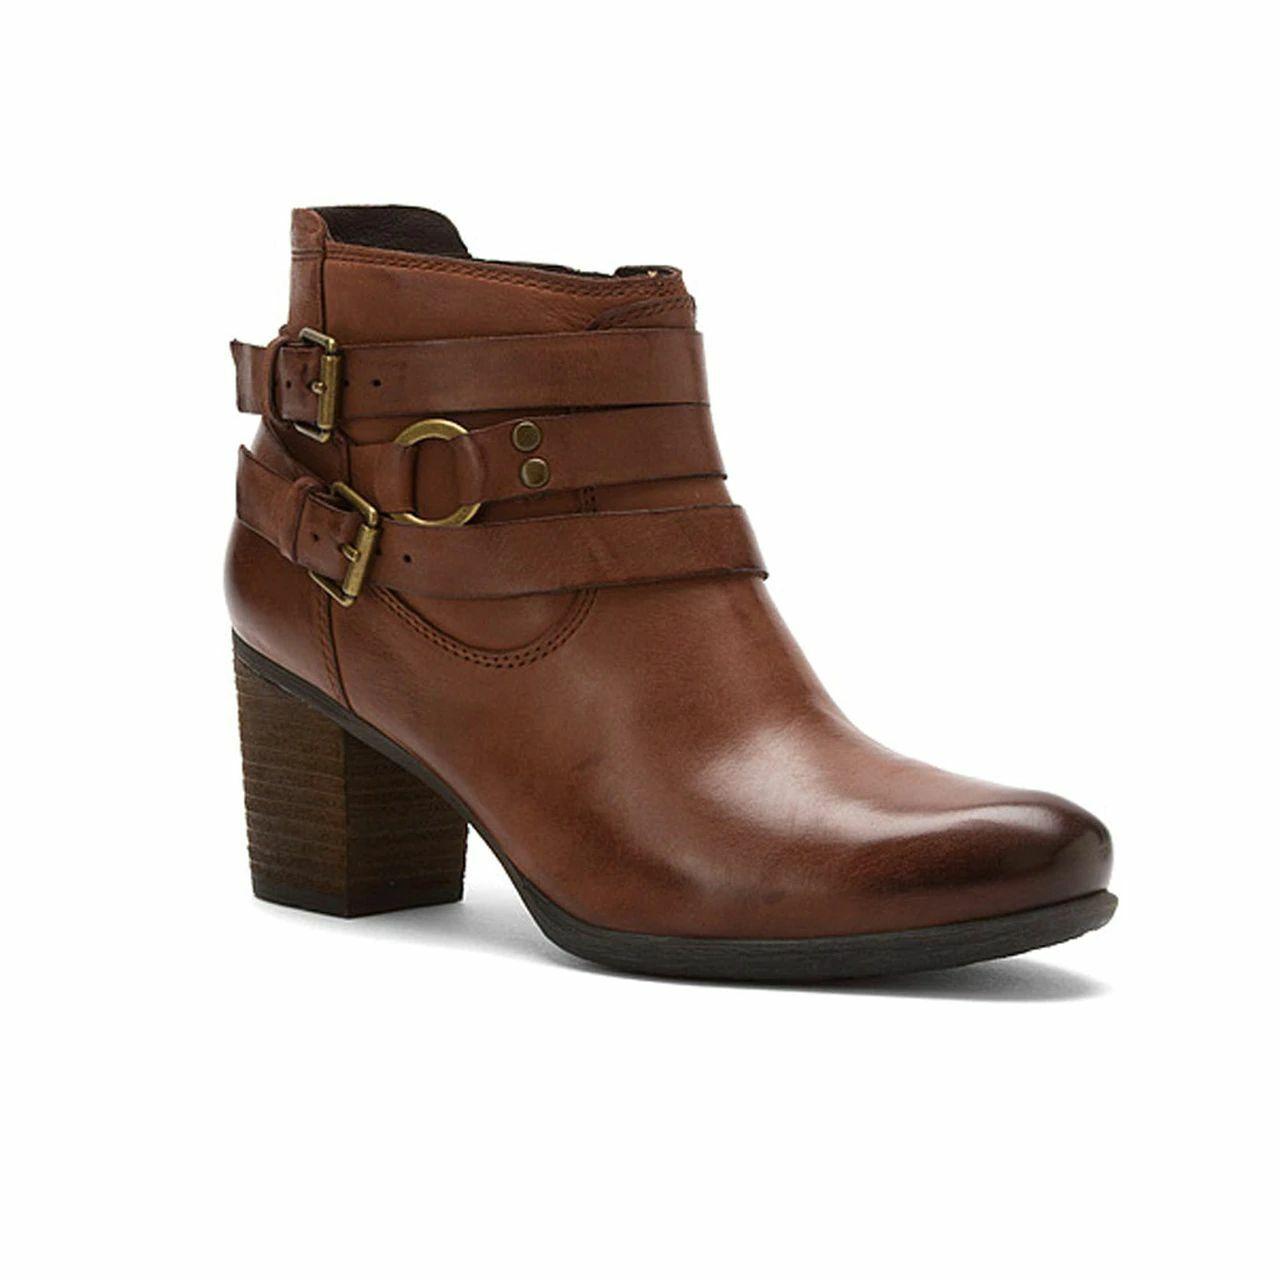 Josef Seibel-Britney Buckle Ankle Boots Sz 38 - image 1